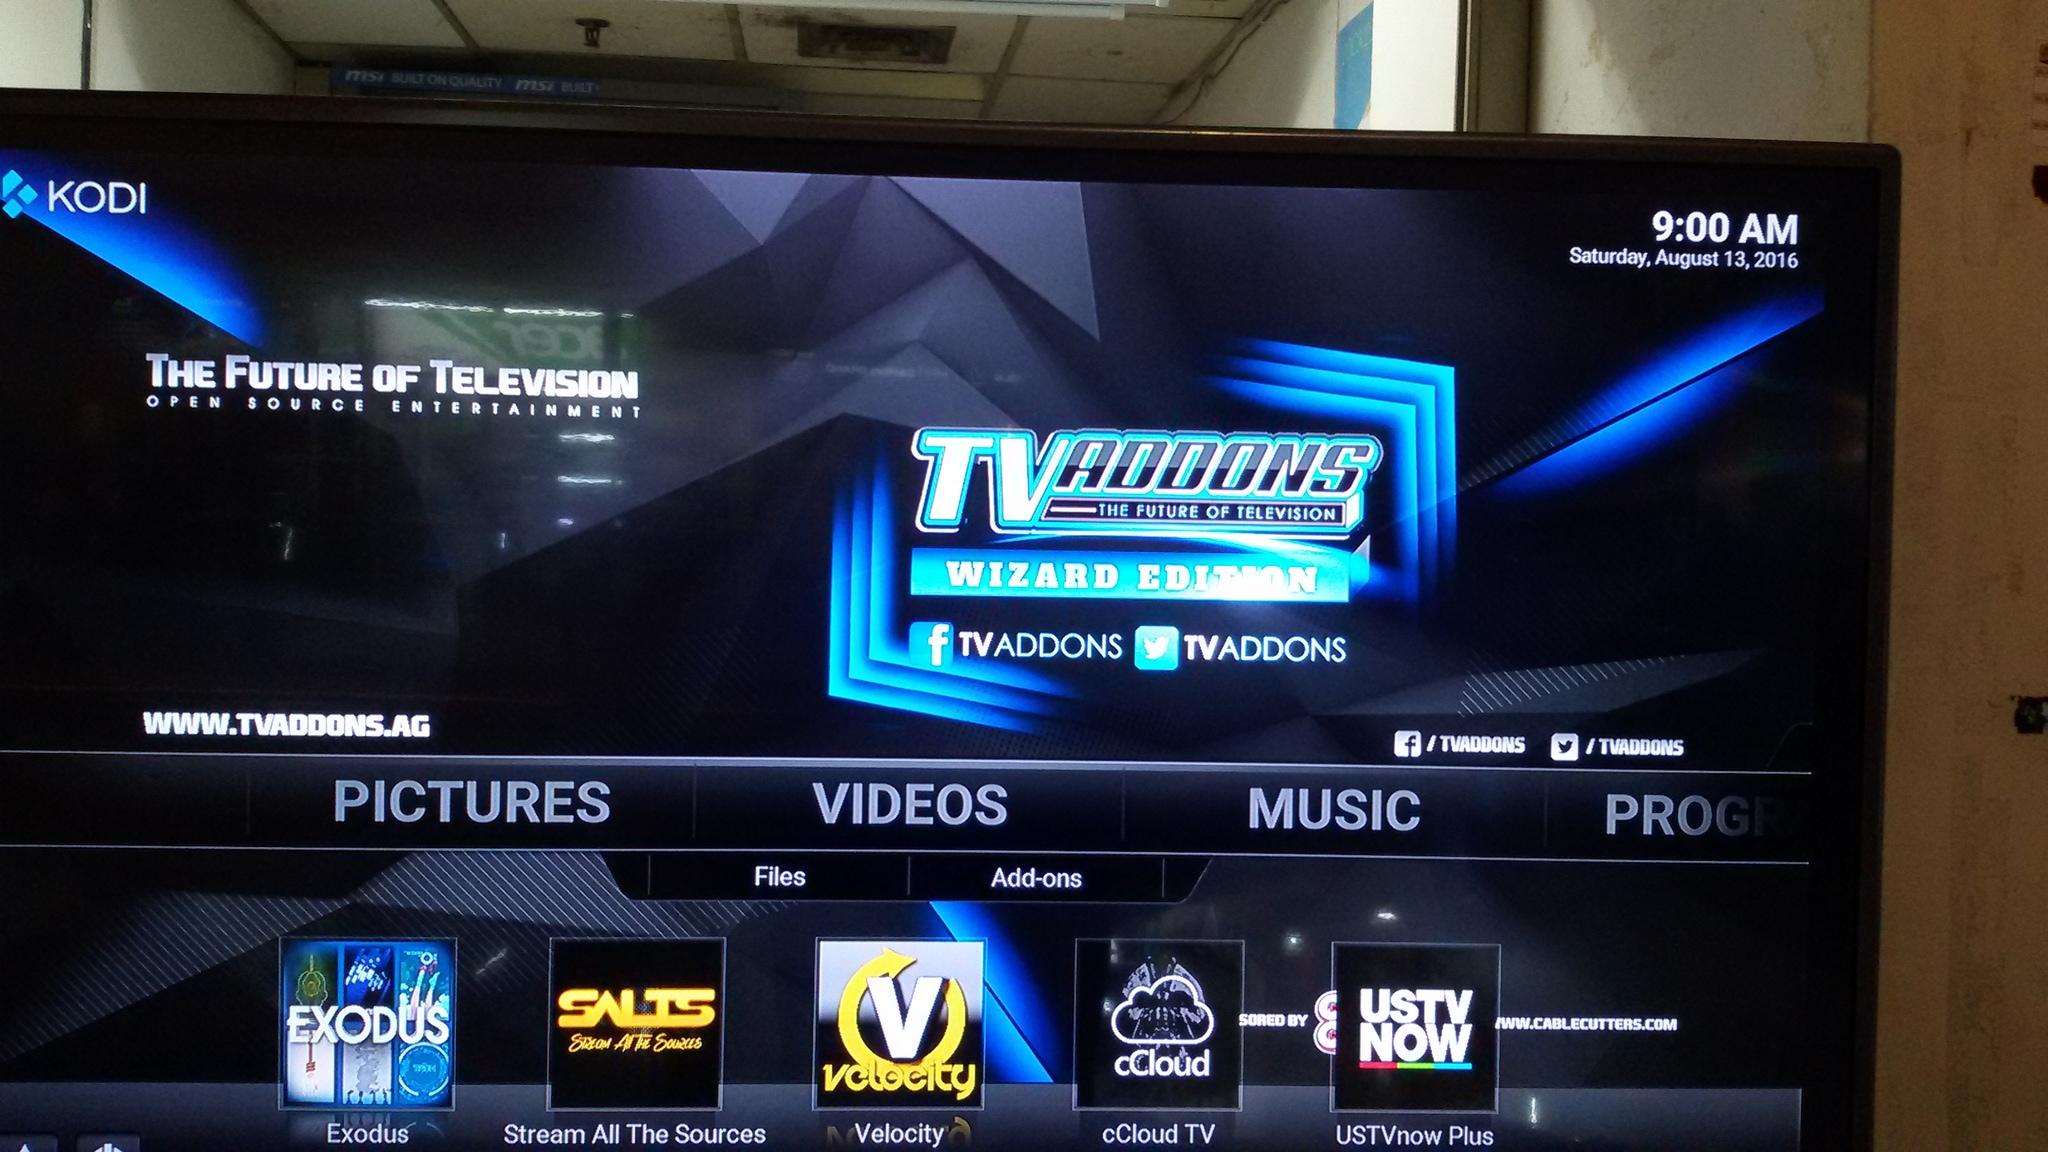 jual android tv box mxq pro 4k s905 kodi addons fusion subtitles lancar jaya online shop. Black Bedroom Furniture Sets. Home Design Ideas